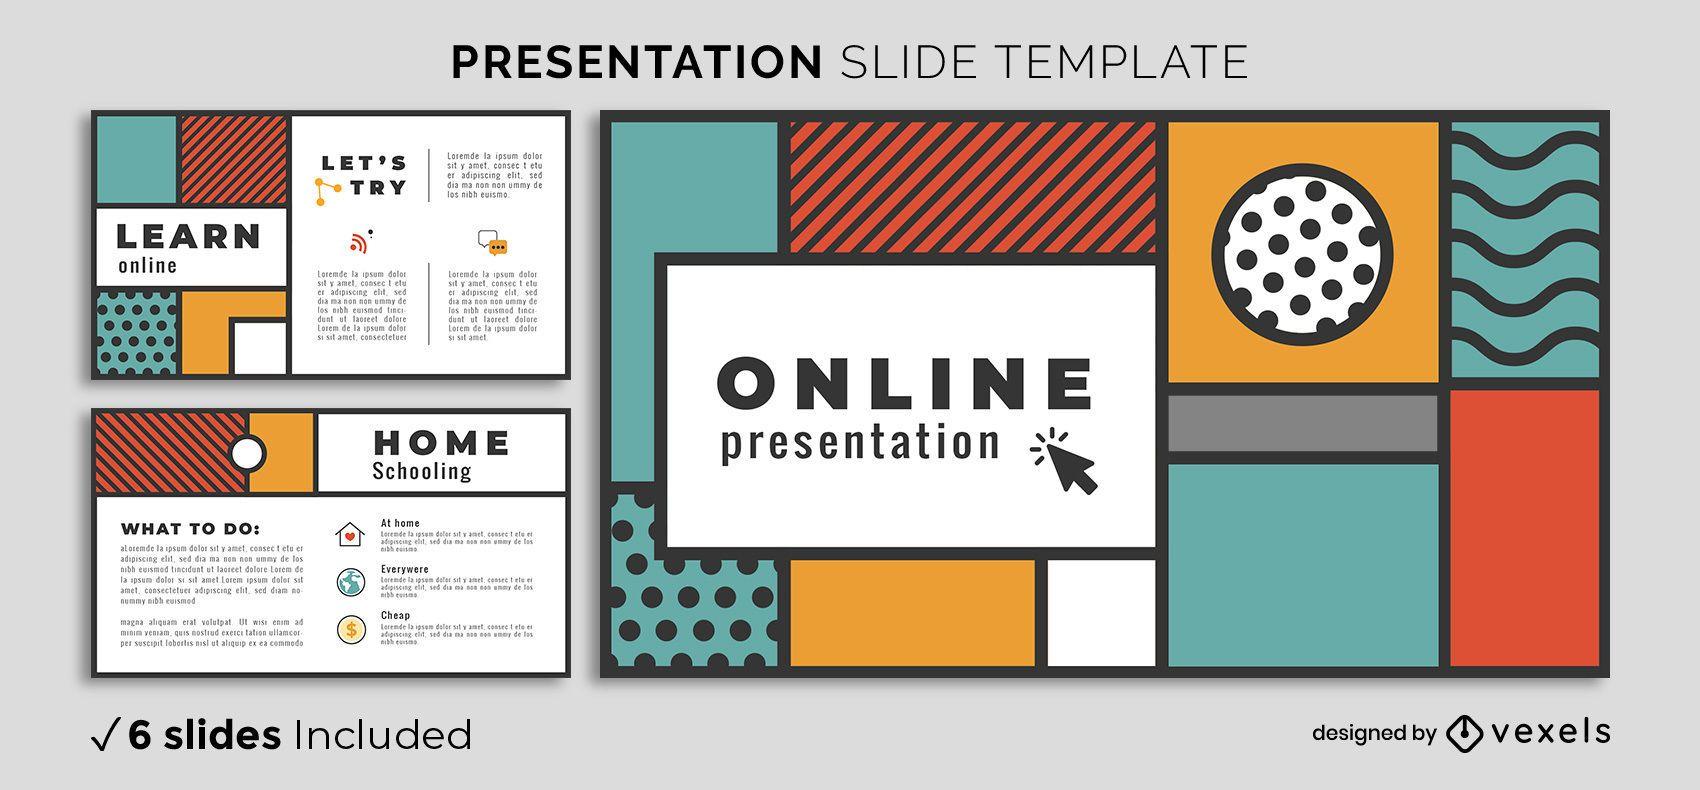 Geometric Shapes Presentation Template